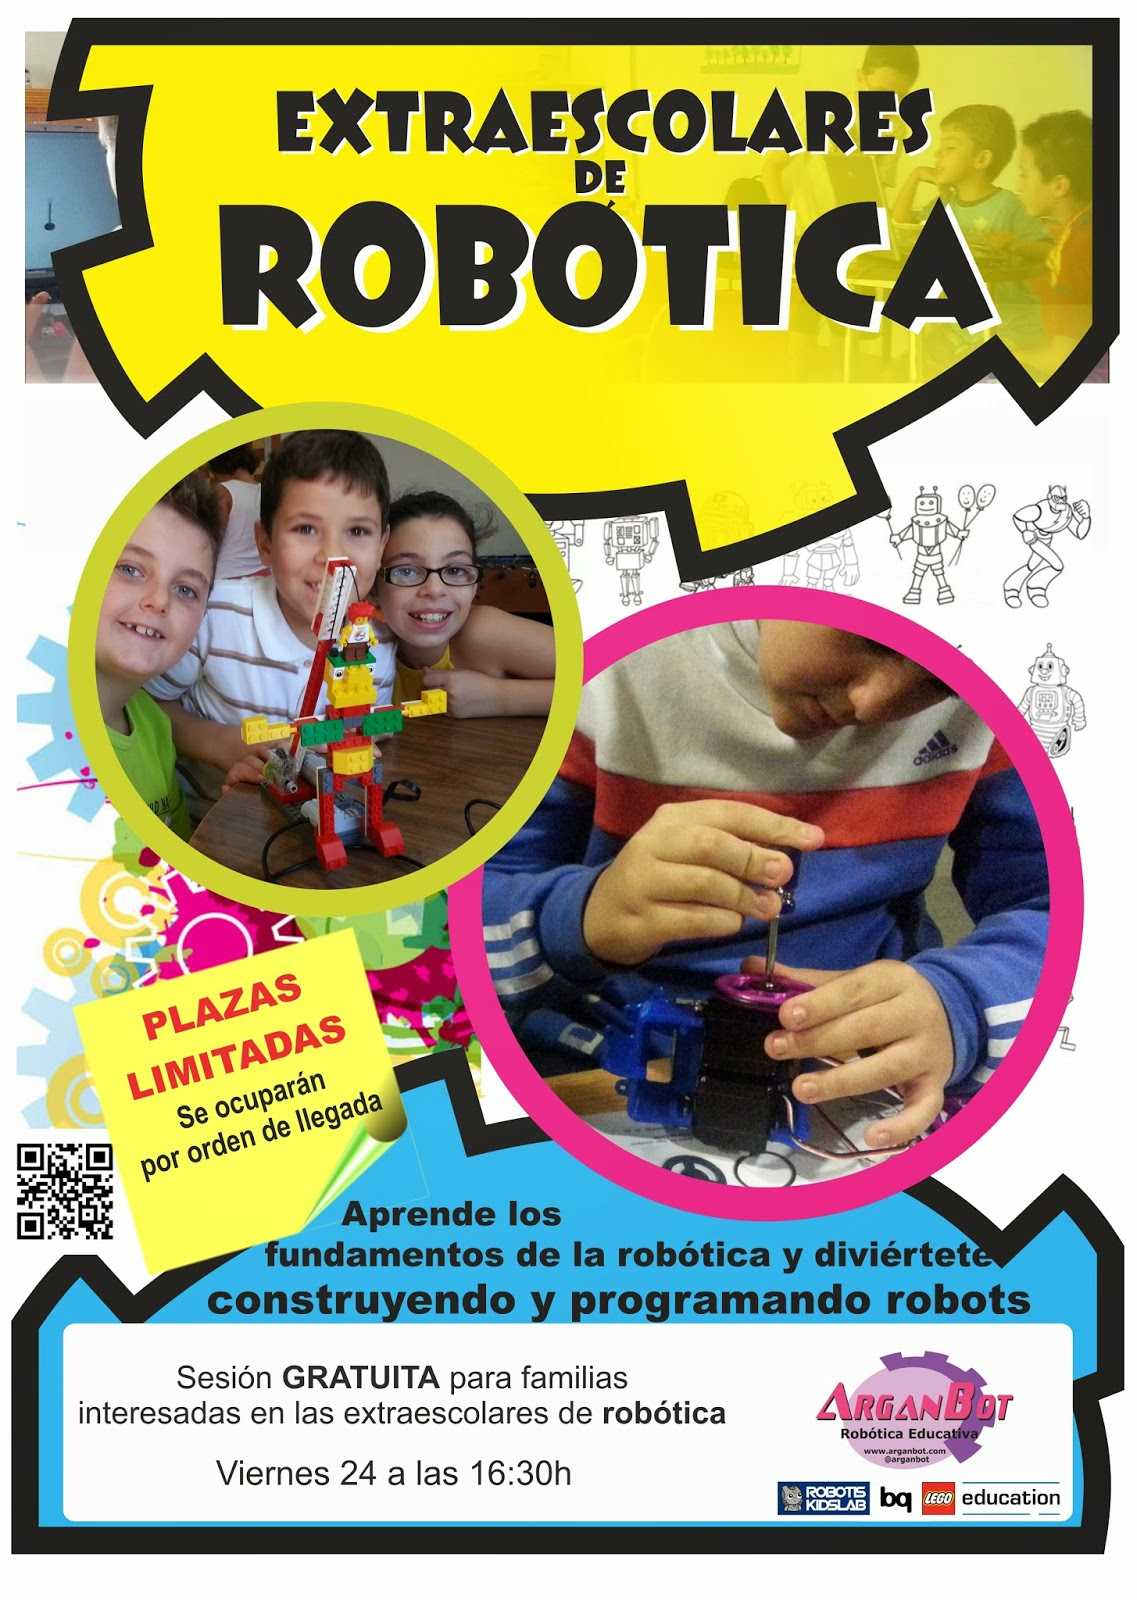 Cartel de sesión gratuita de Robótica